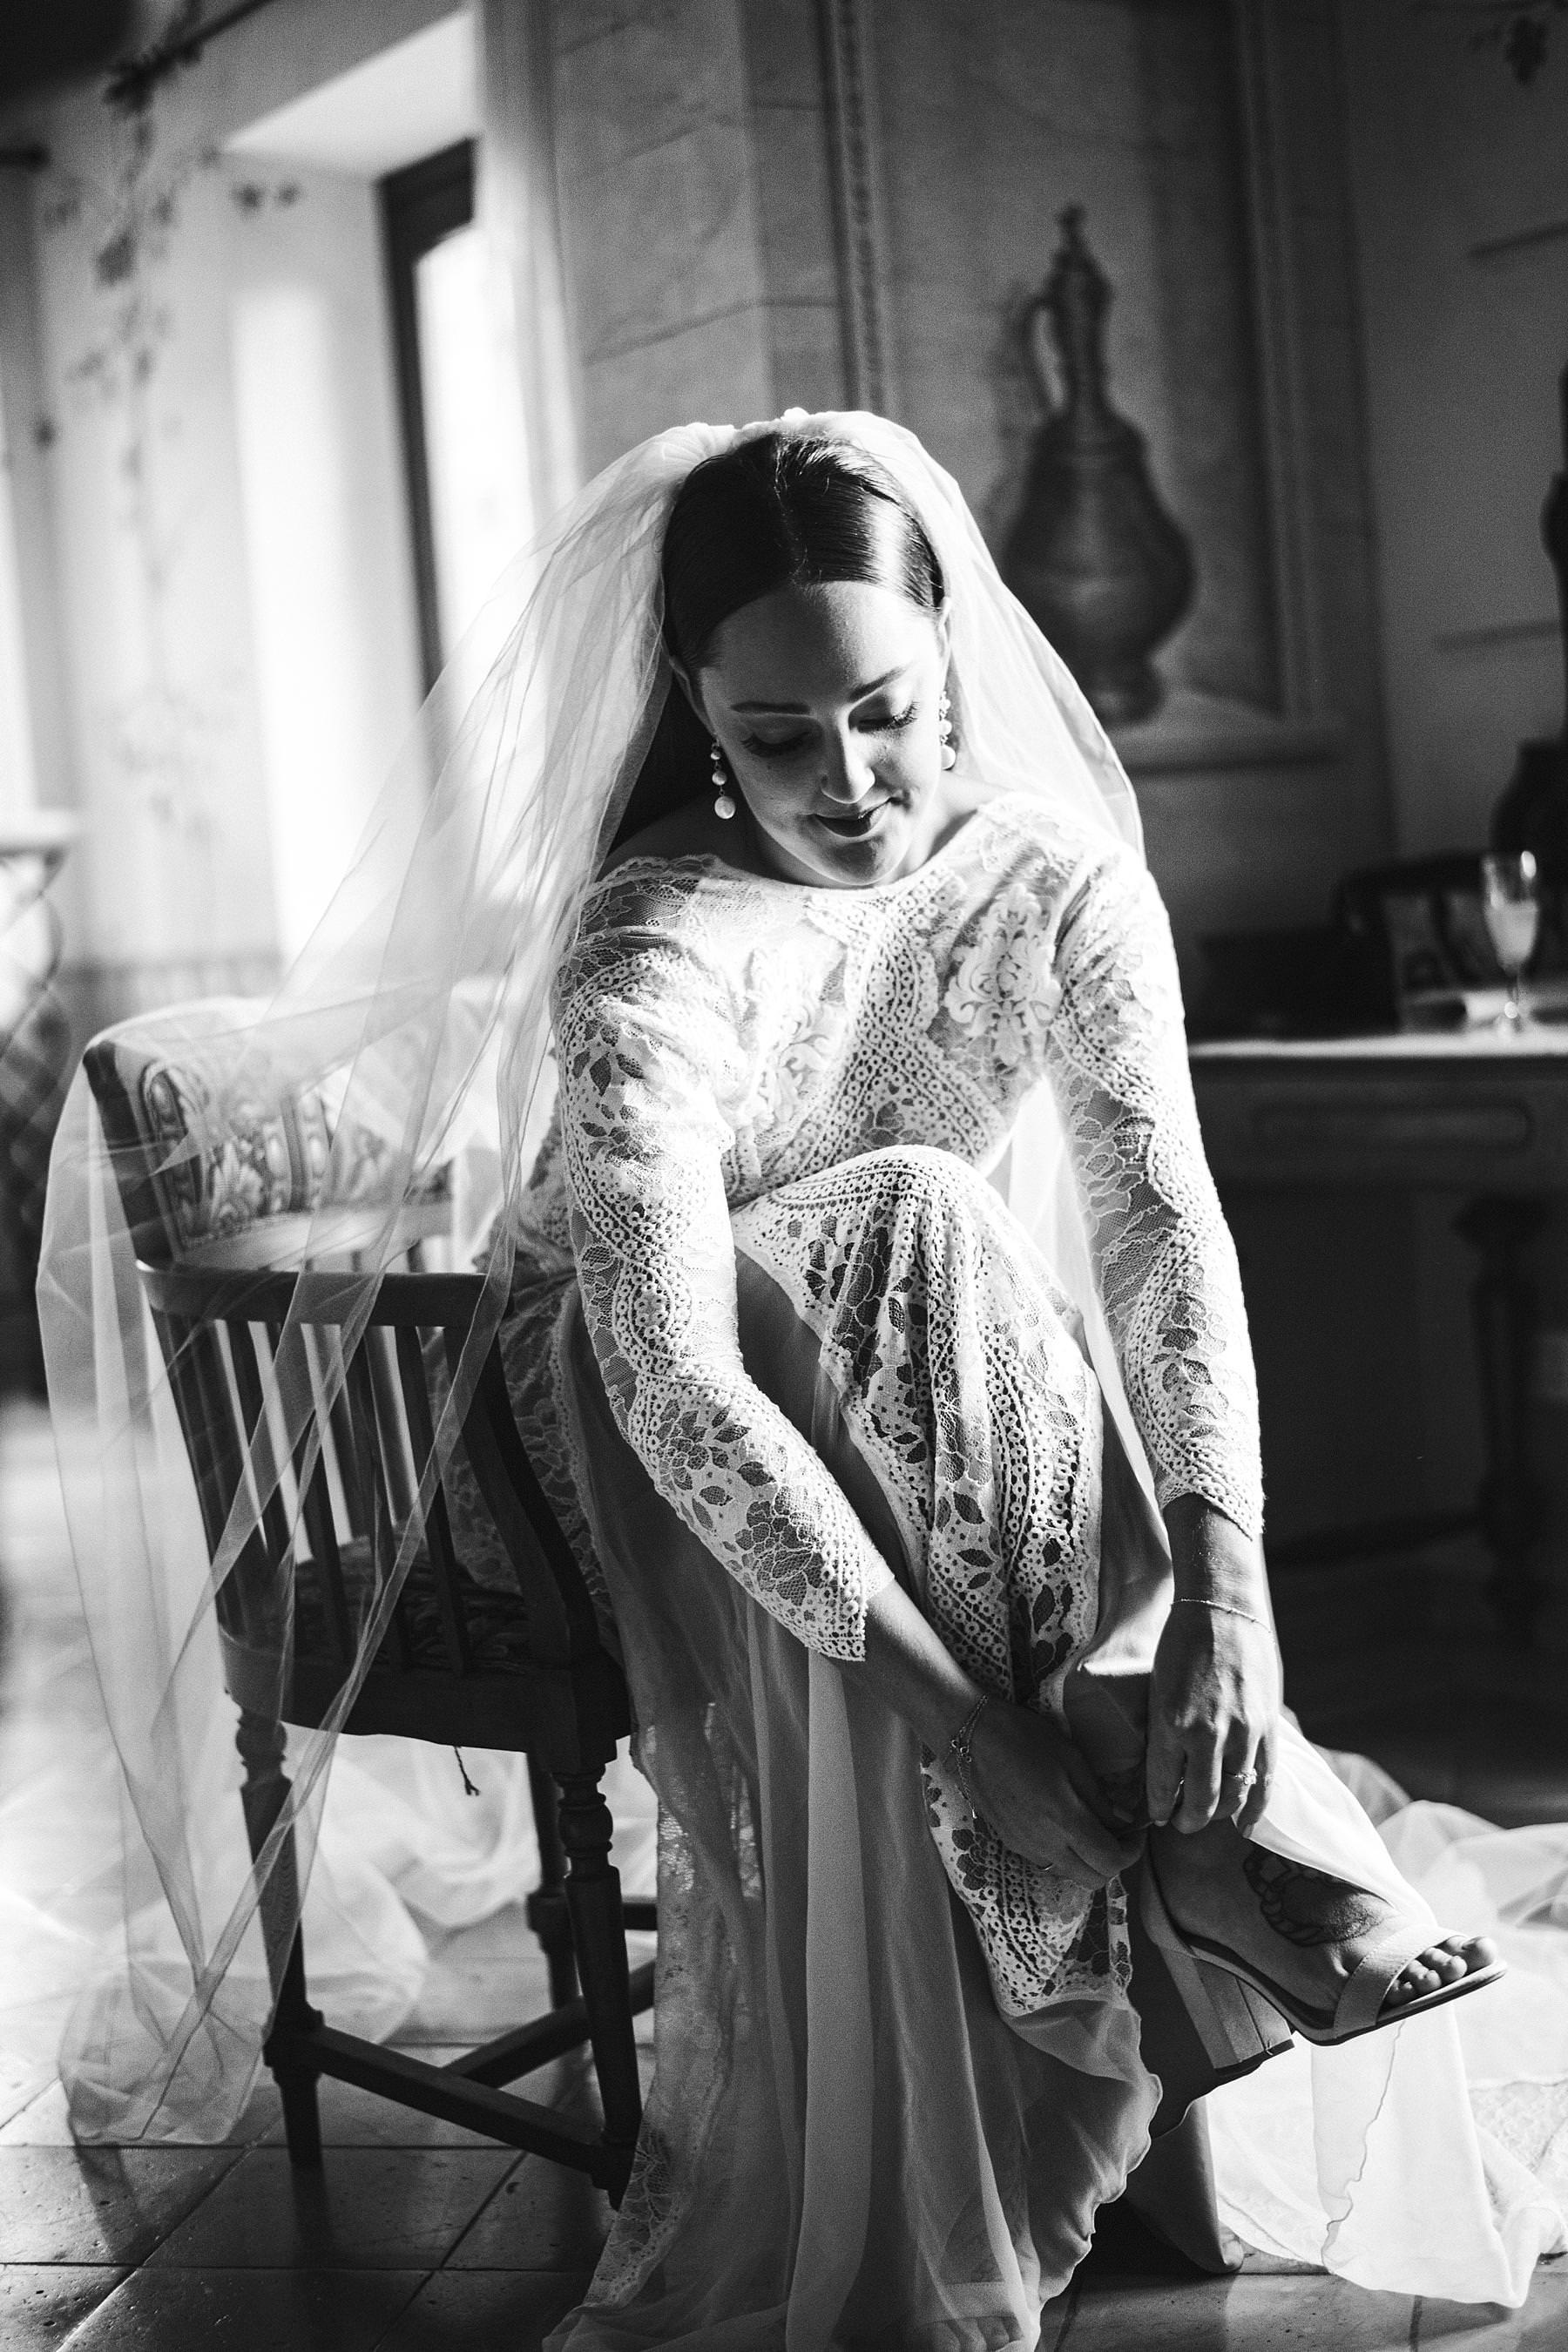 Elegant destination intimate wedding in Umbria at Villa l'Antica Posta incredible venue. Gorgeous bride in Grace Loves Lace wedding dress